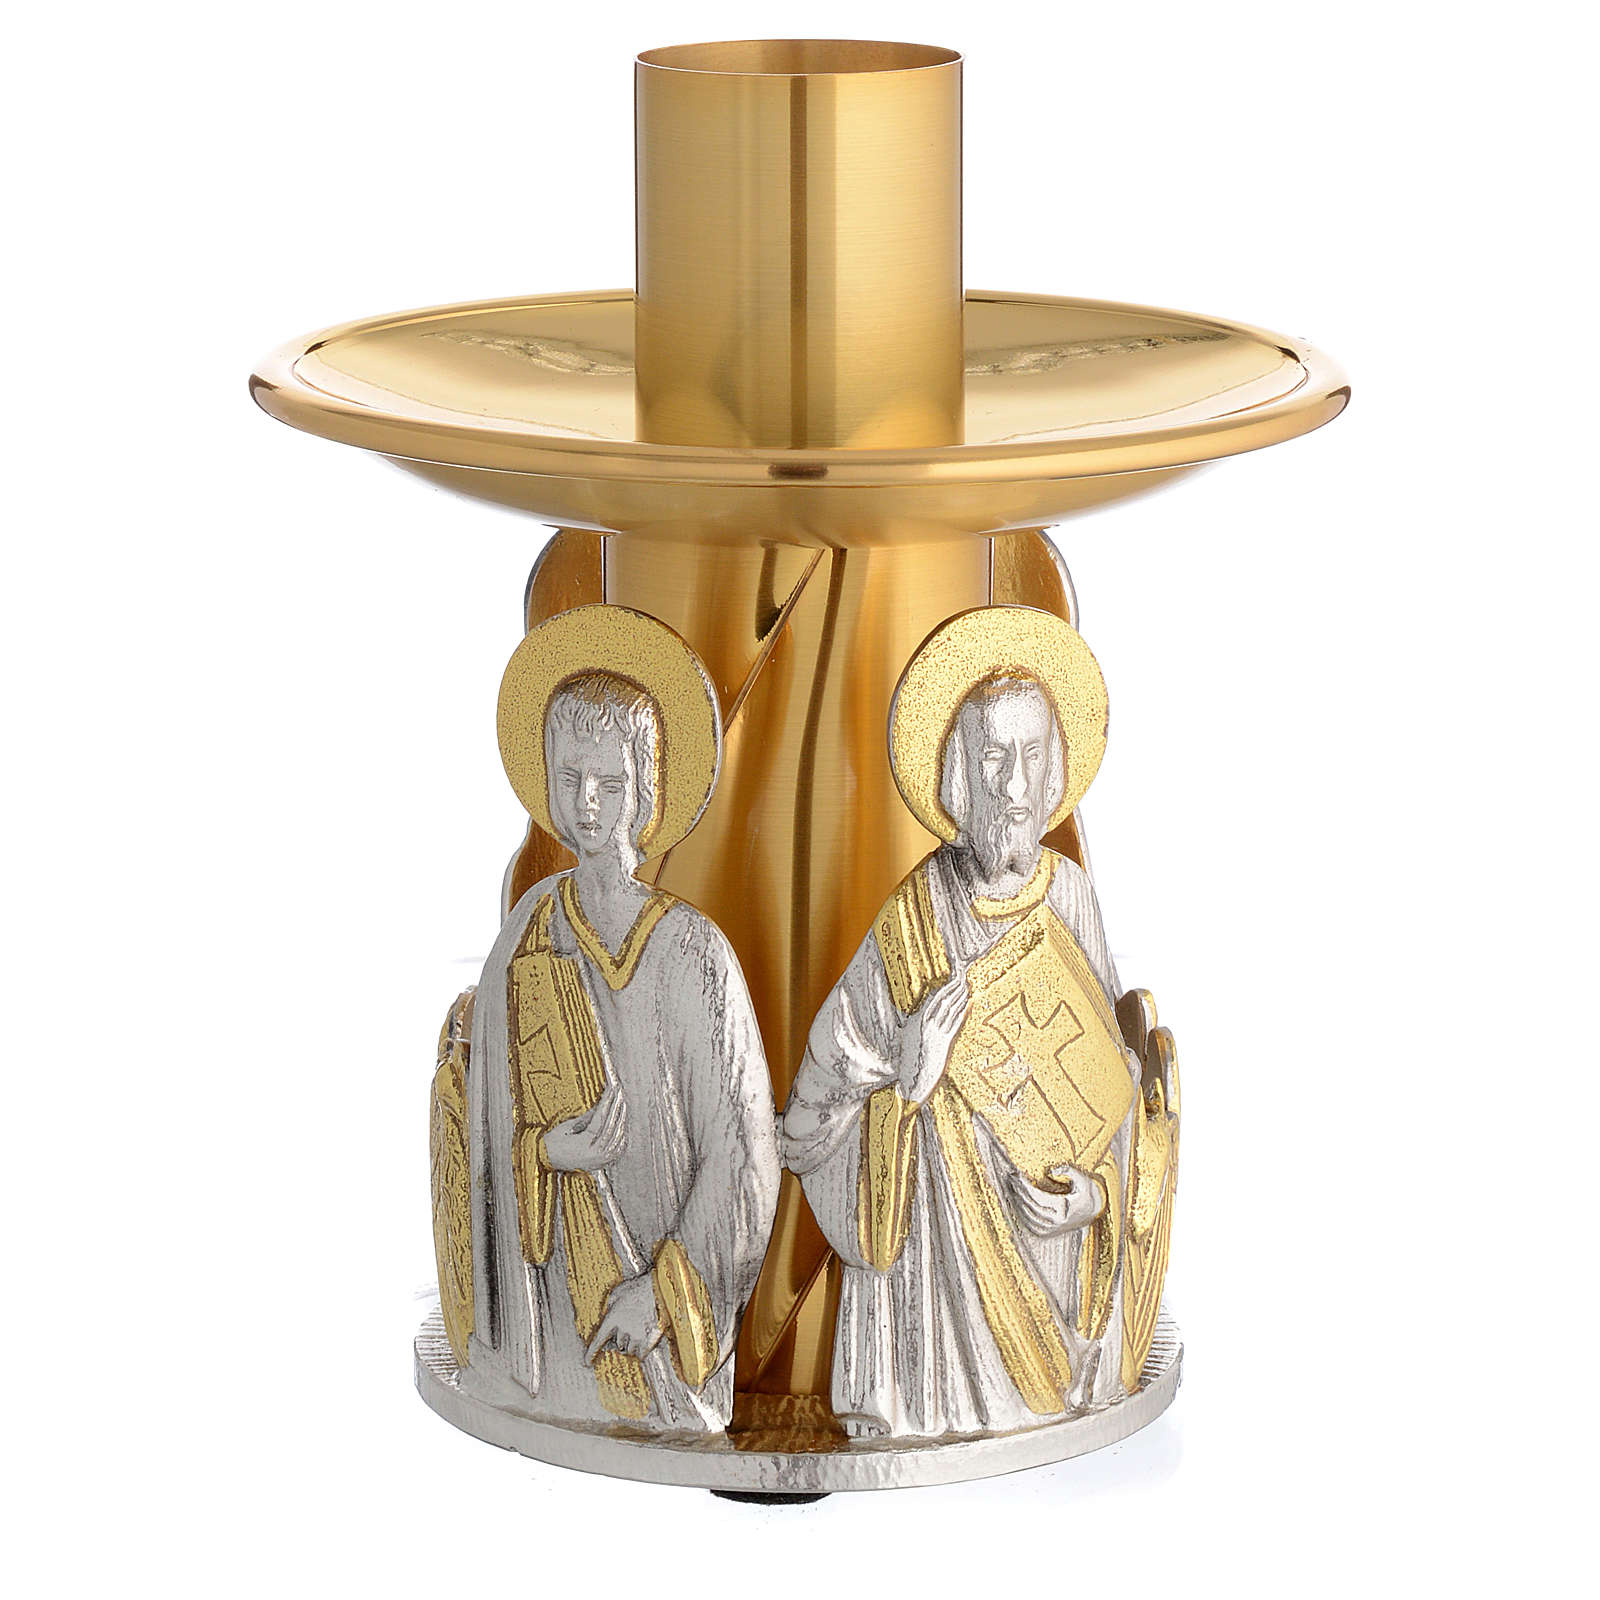 Portacandela bronzo dorato 4 evangelisti 4